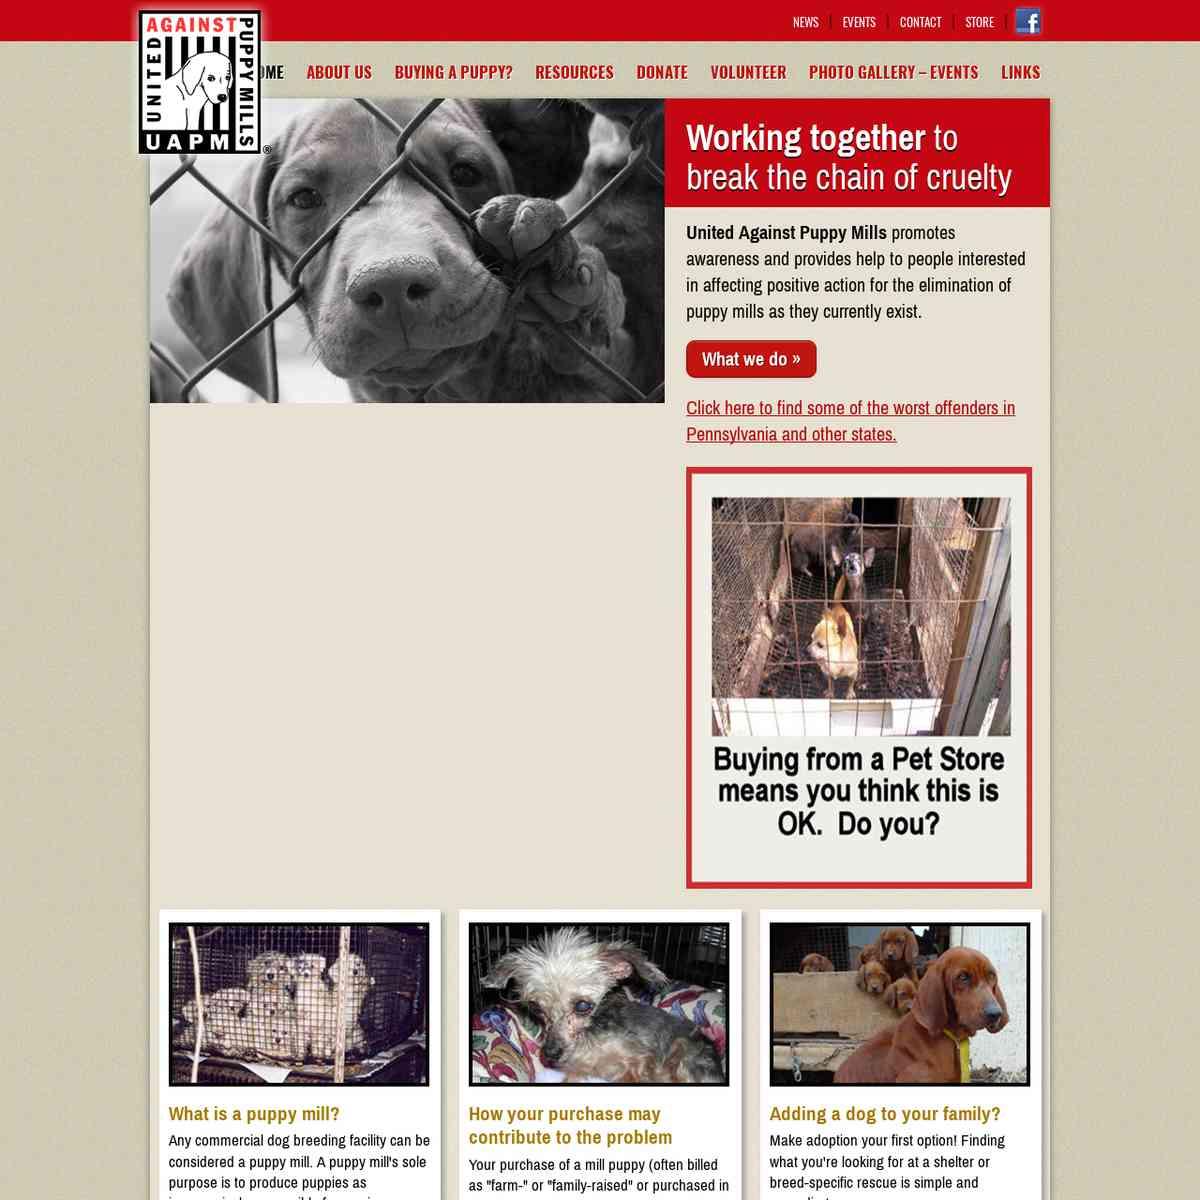 United Against Puppy Mills